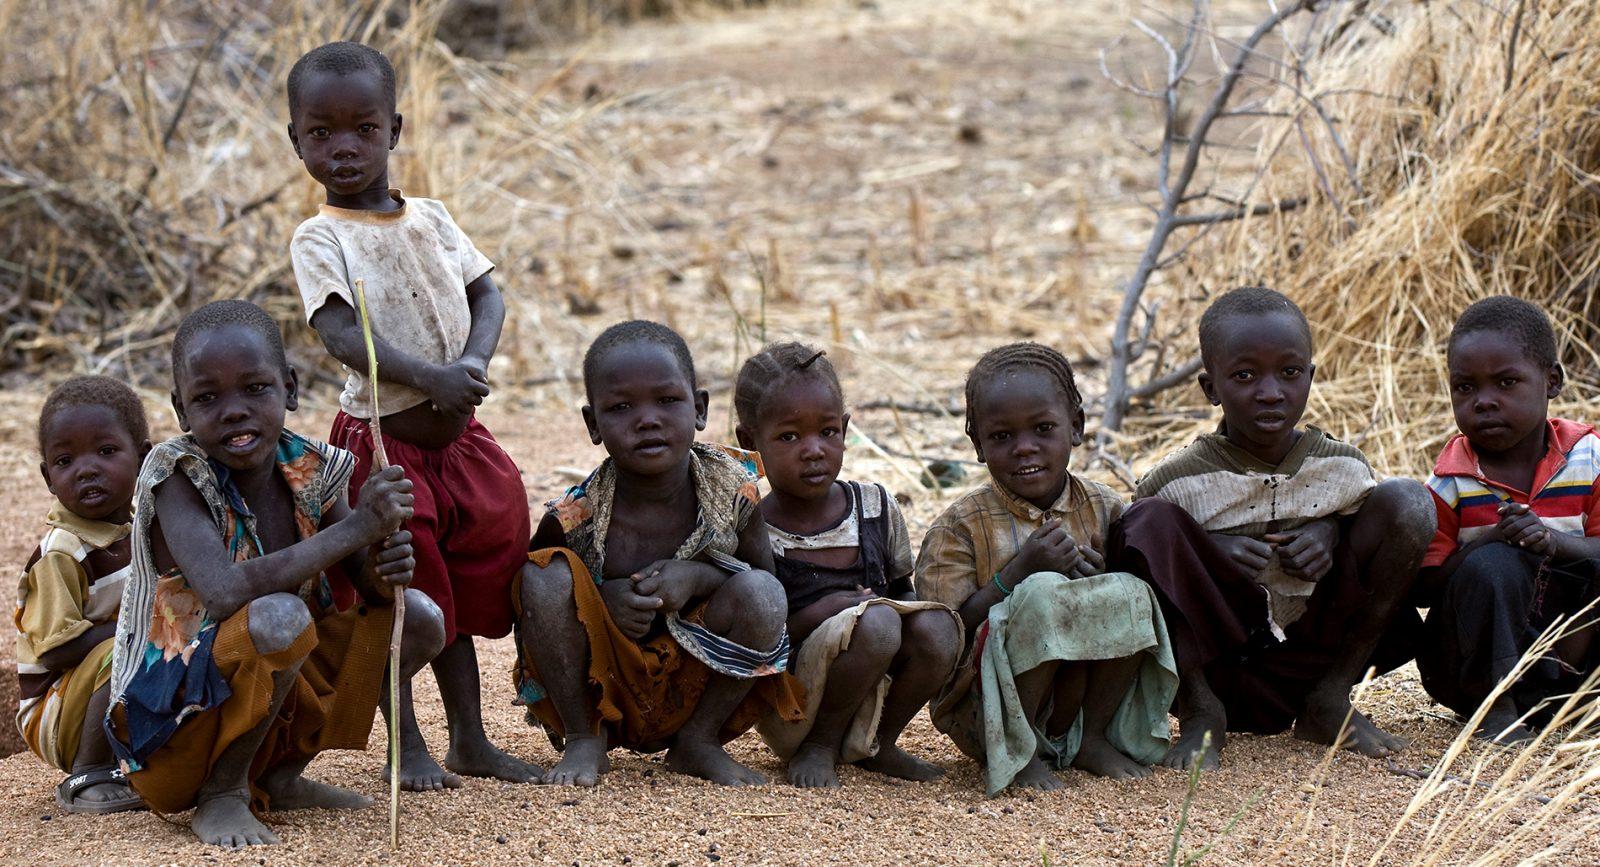 A group of IDP children in Dalami County, South Kordofan, Sudan.